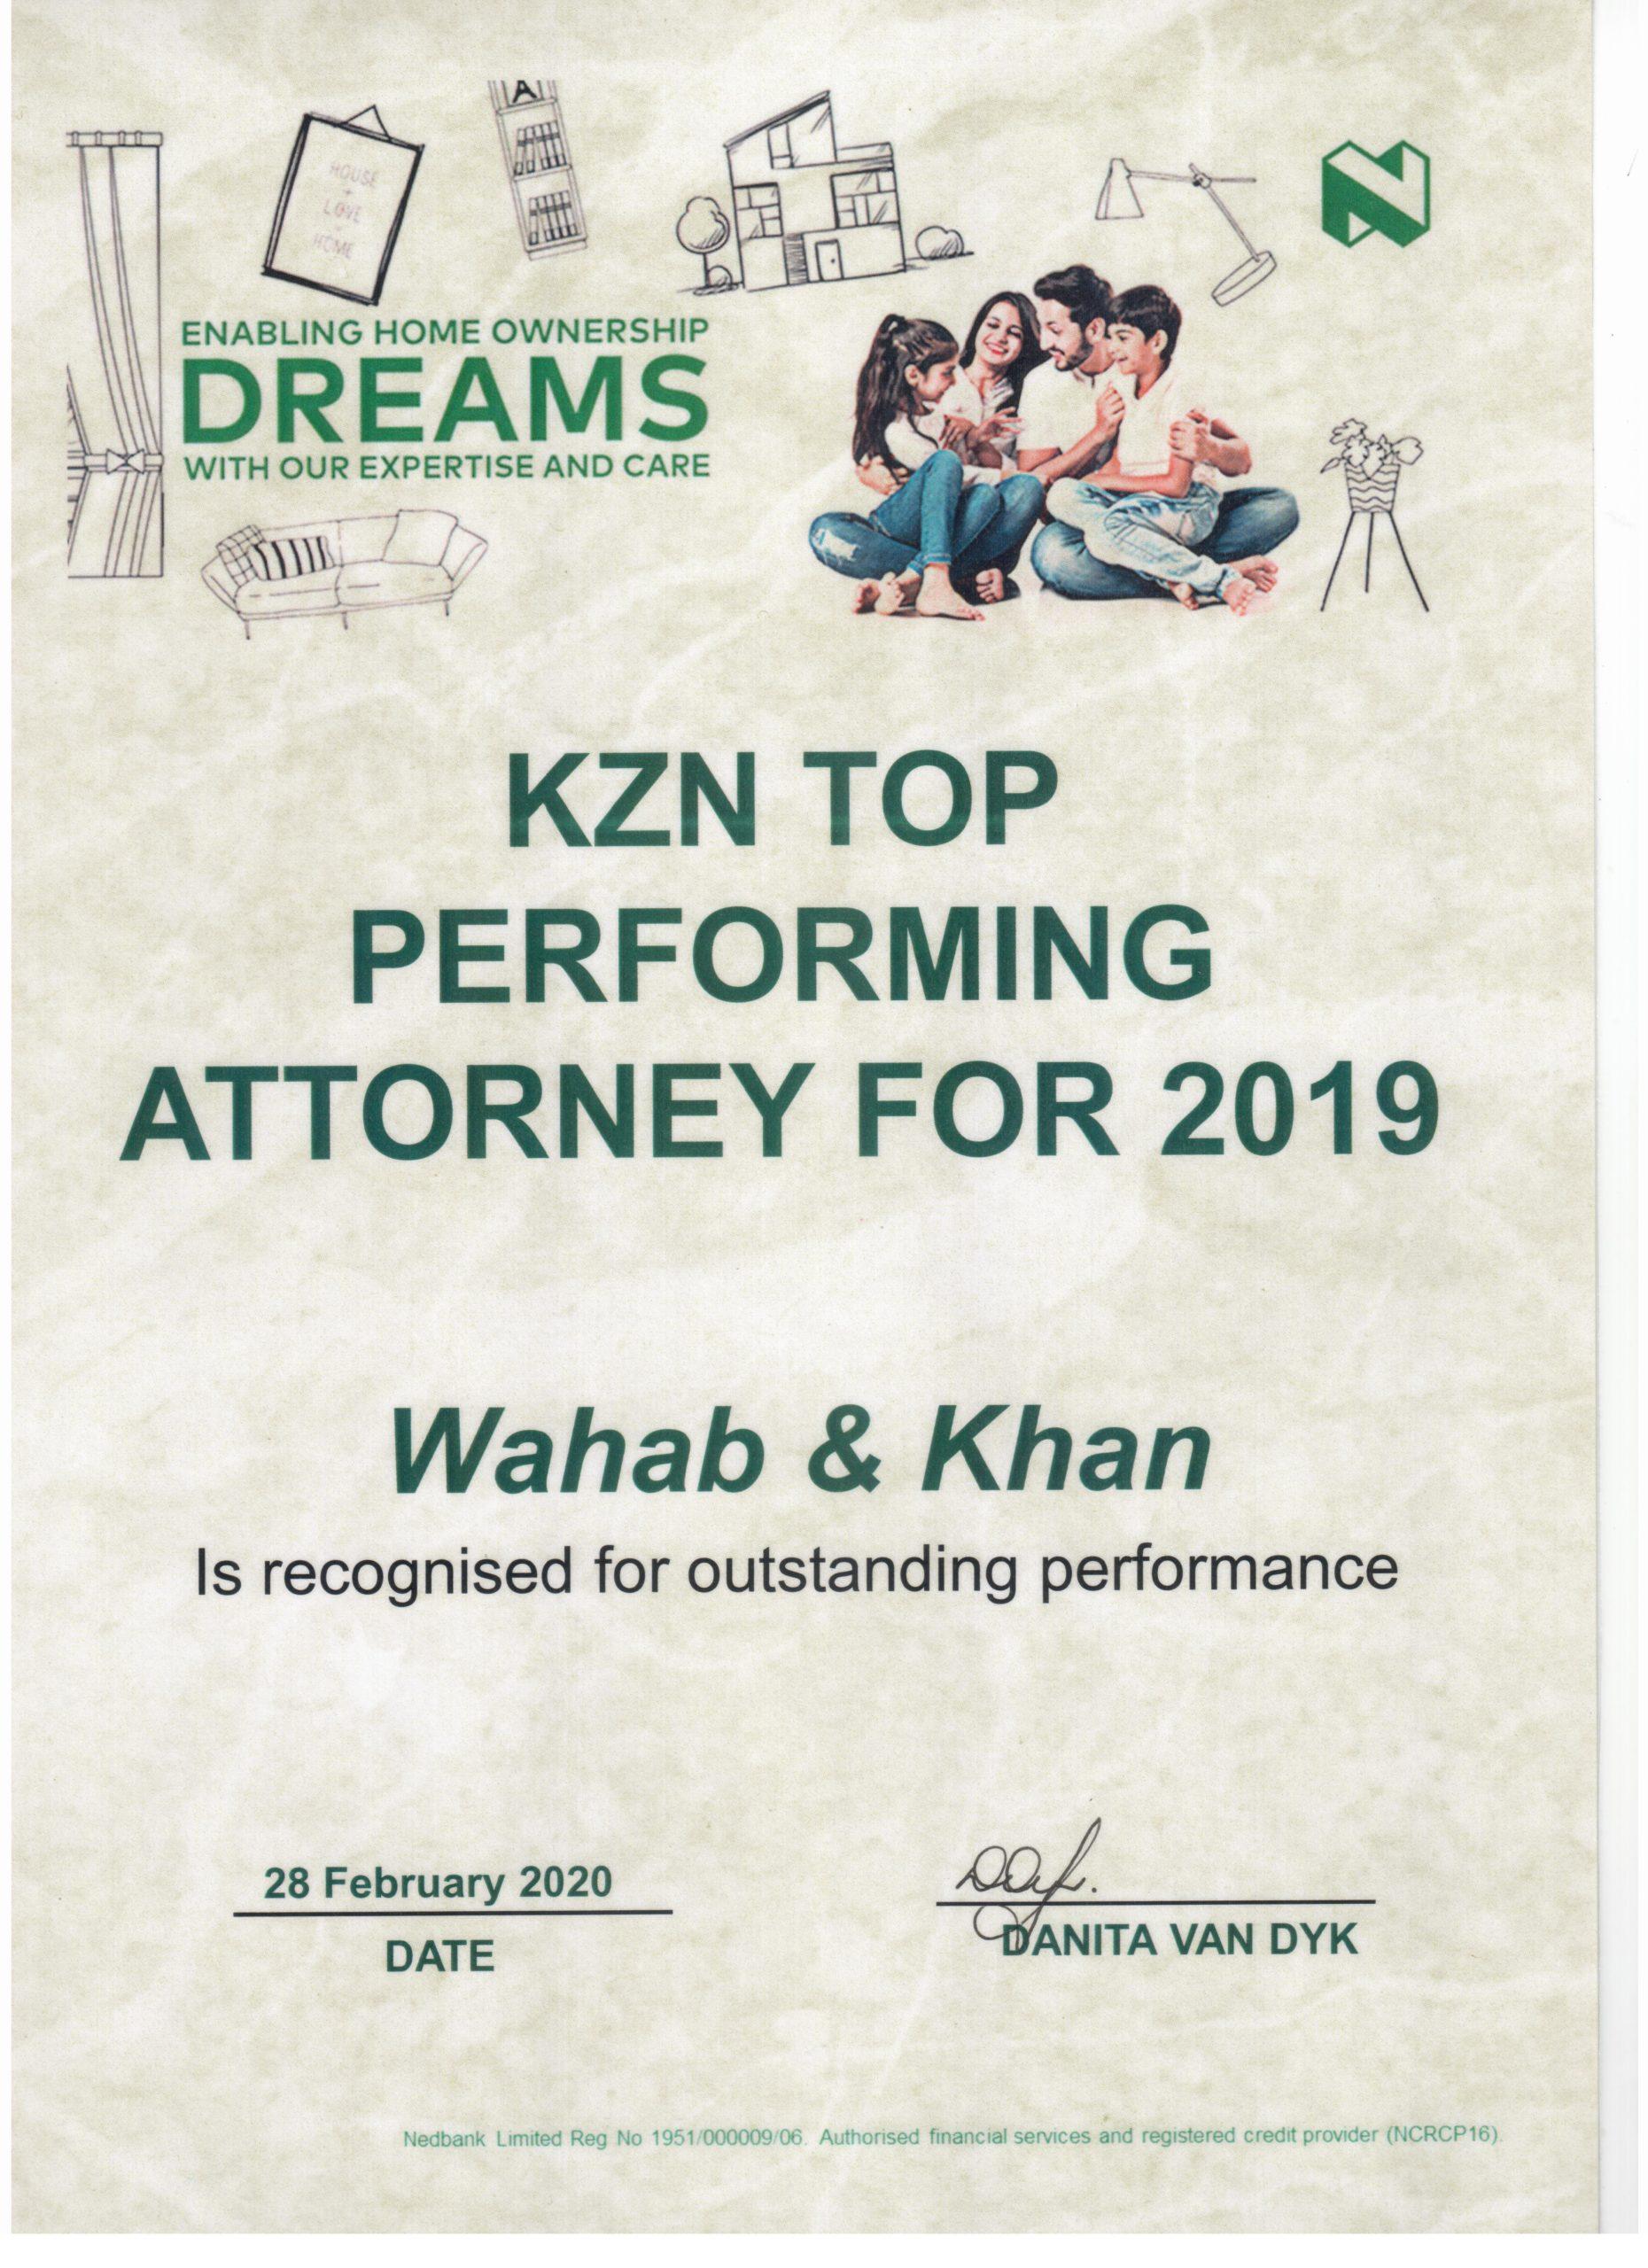 https://wahabkhan.co.za/wp-content/uploads/2021/03/Nedbank-2019-001-scaled.jpg